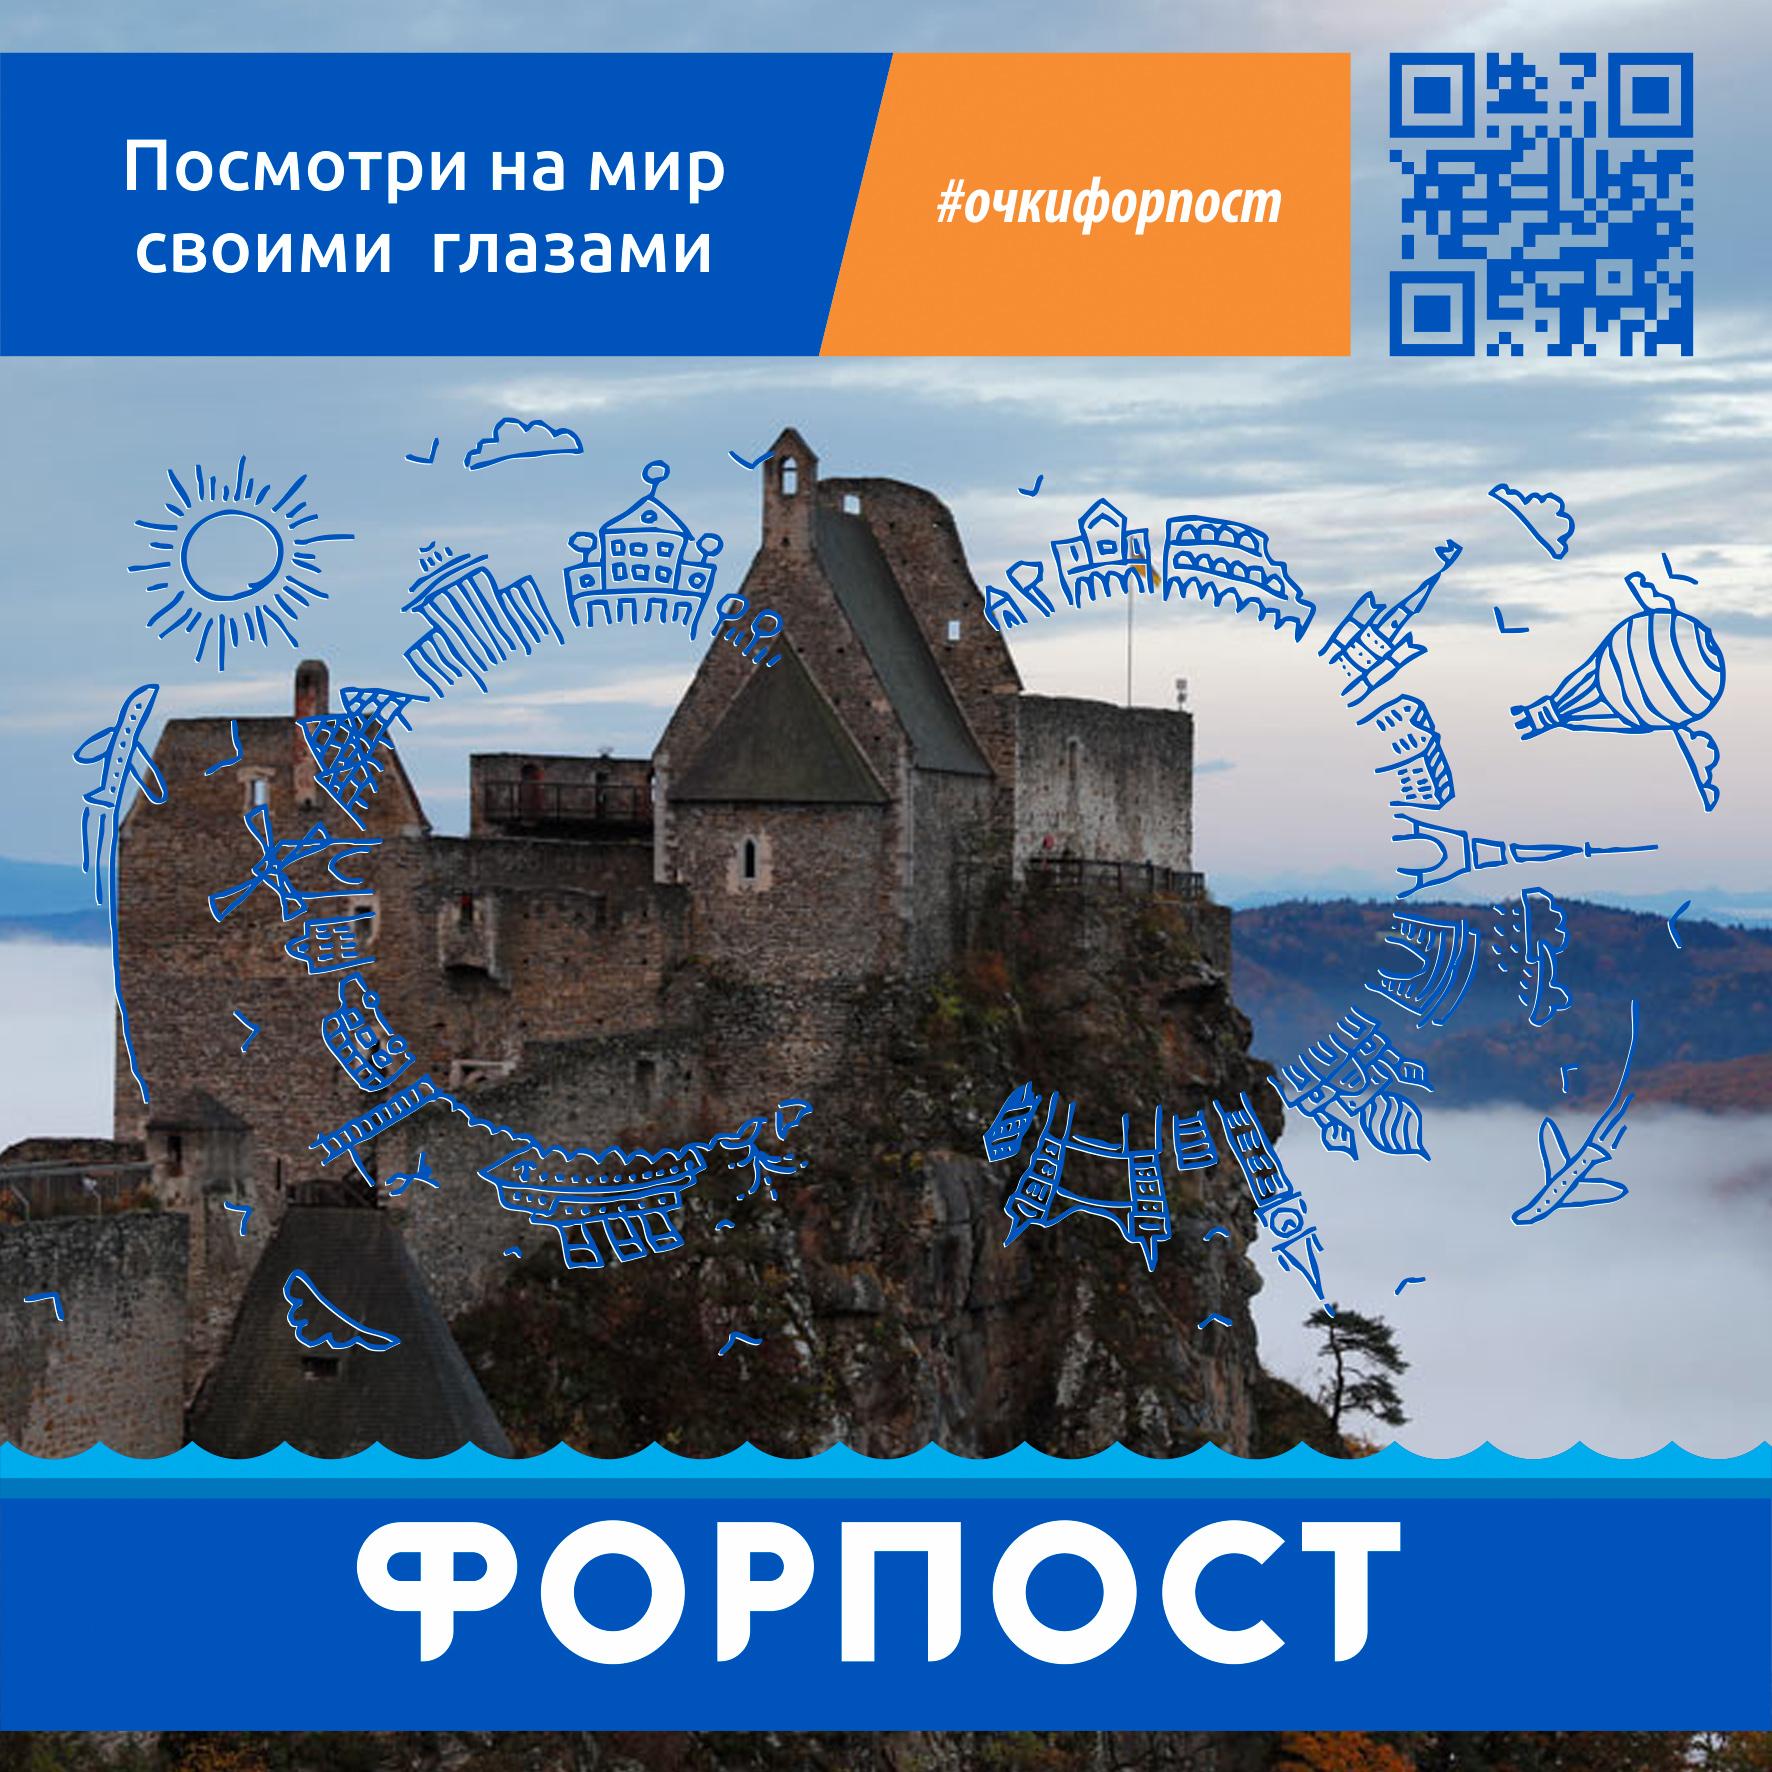 Дизайн флаера на прозрачном пластике фото f_8185ba23a658e00a.jpg